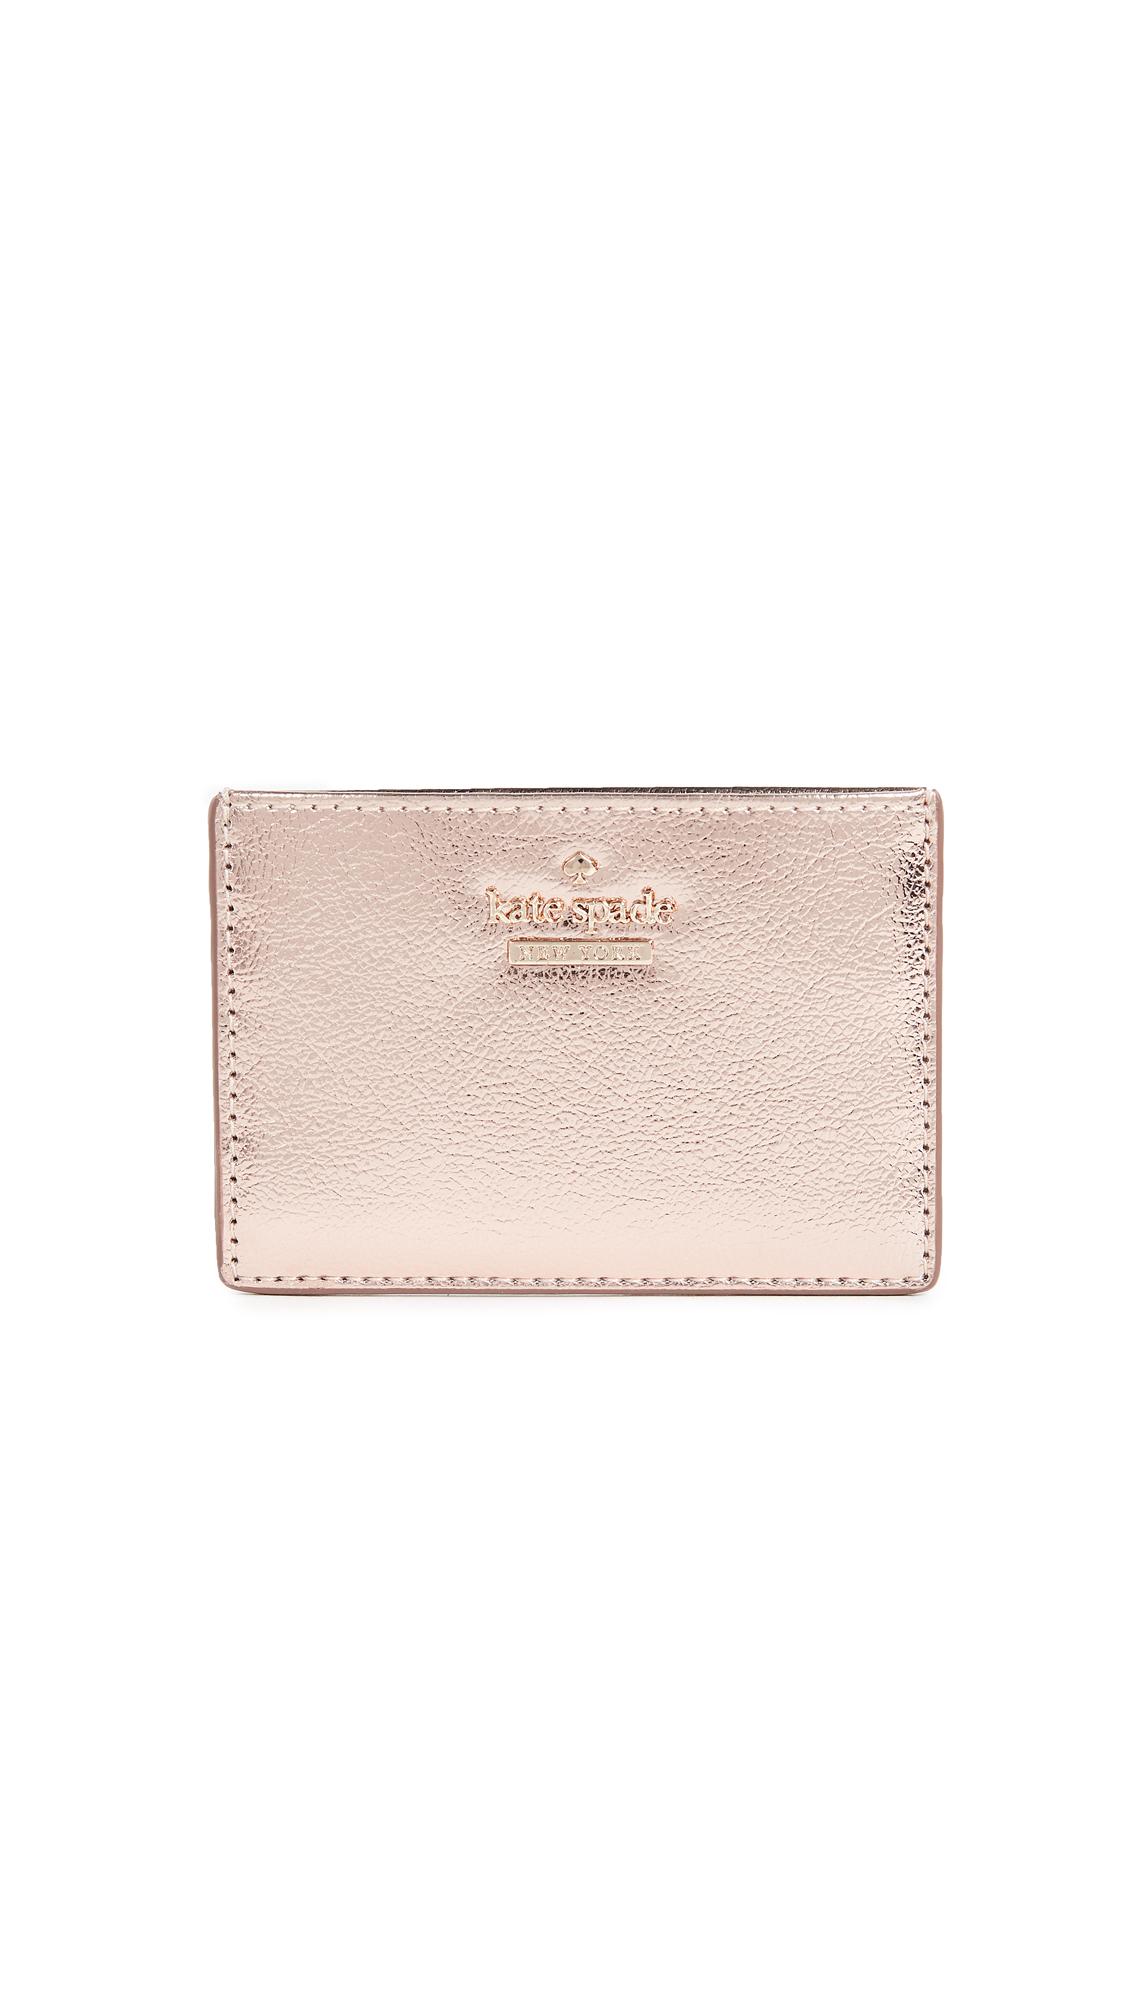 Kate Spade New York Highland Drive Card Holder - Soft Rose Gold